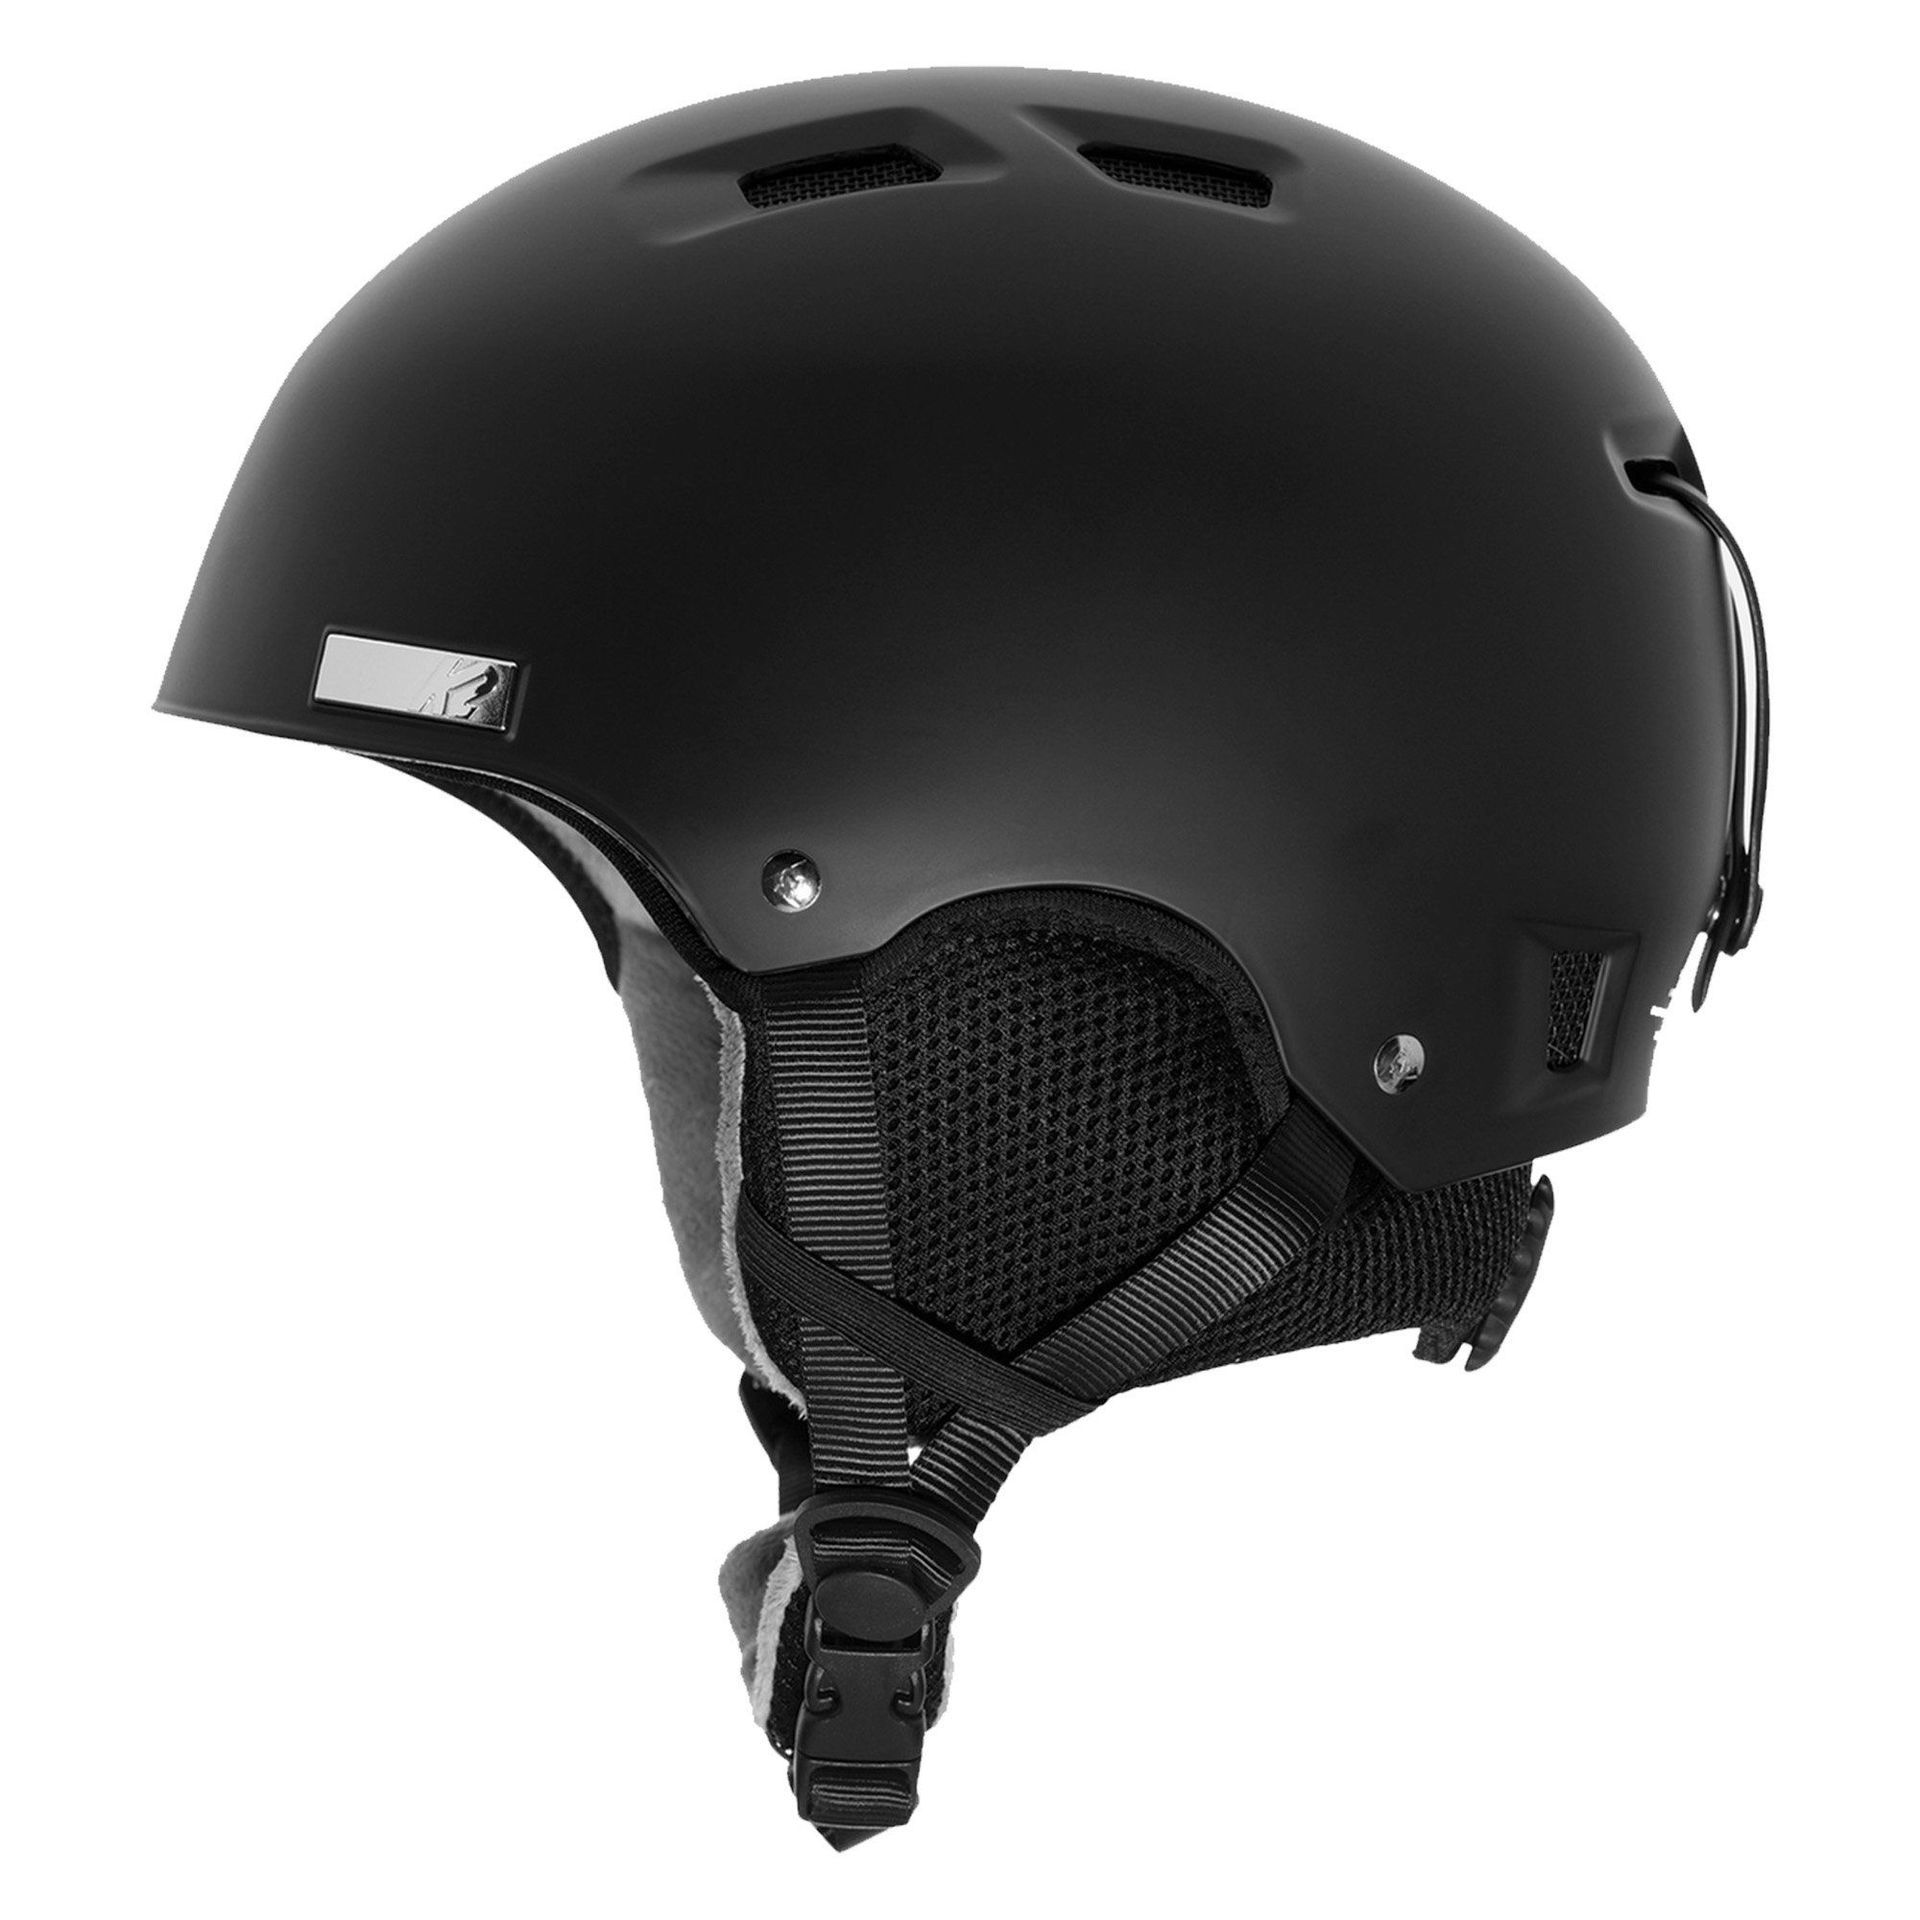 KASK K2 VERDICT 1054005-11 BLACK